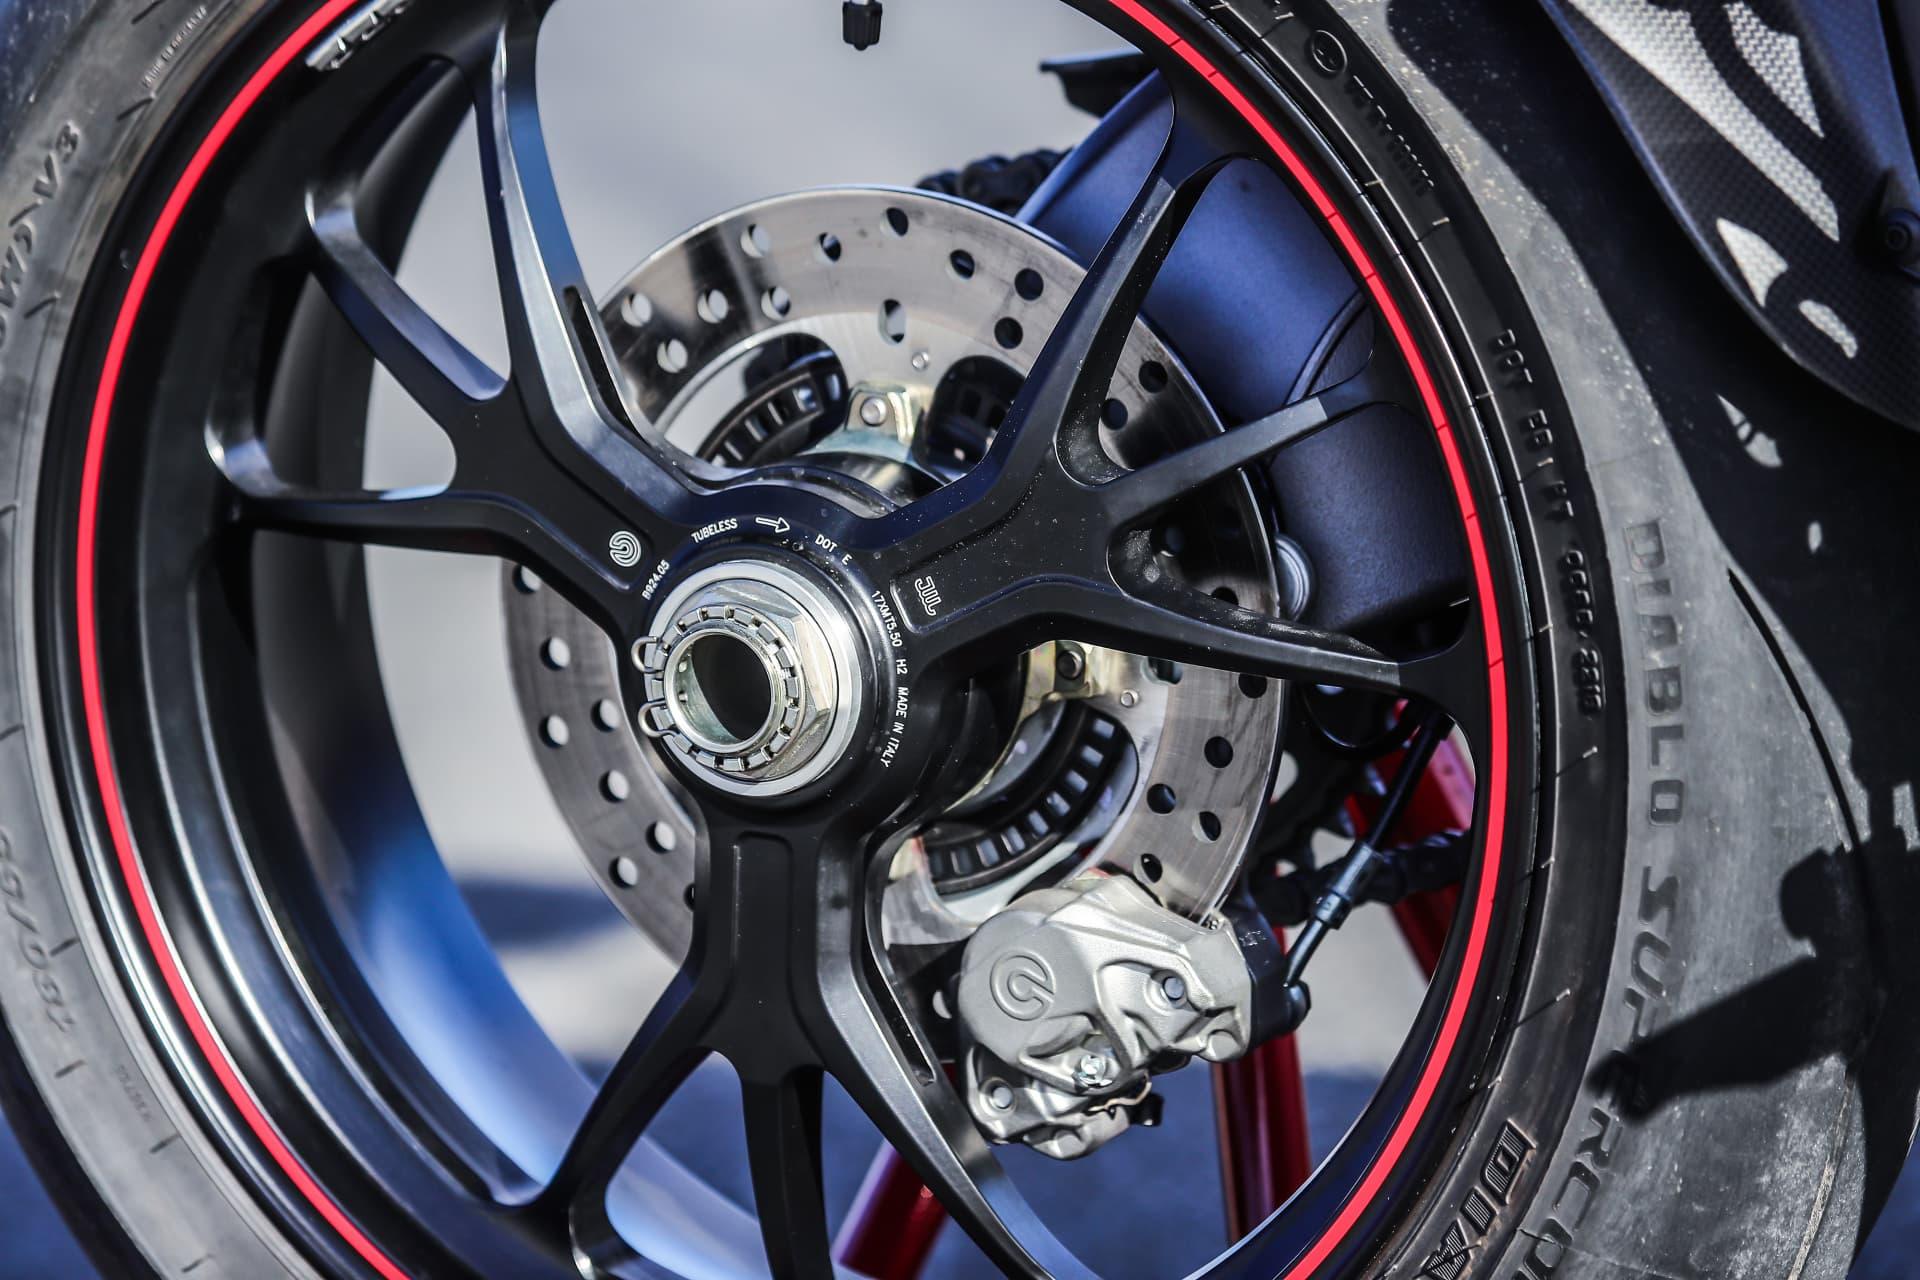 Ducati Hypermotard 950 Sp Static 24 Uc70323 Mid